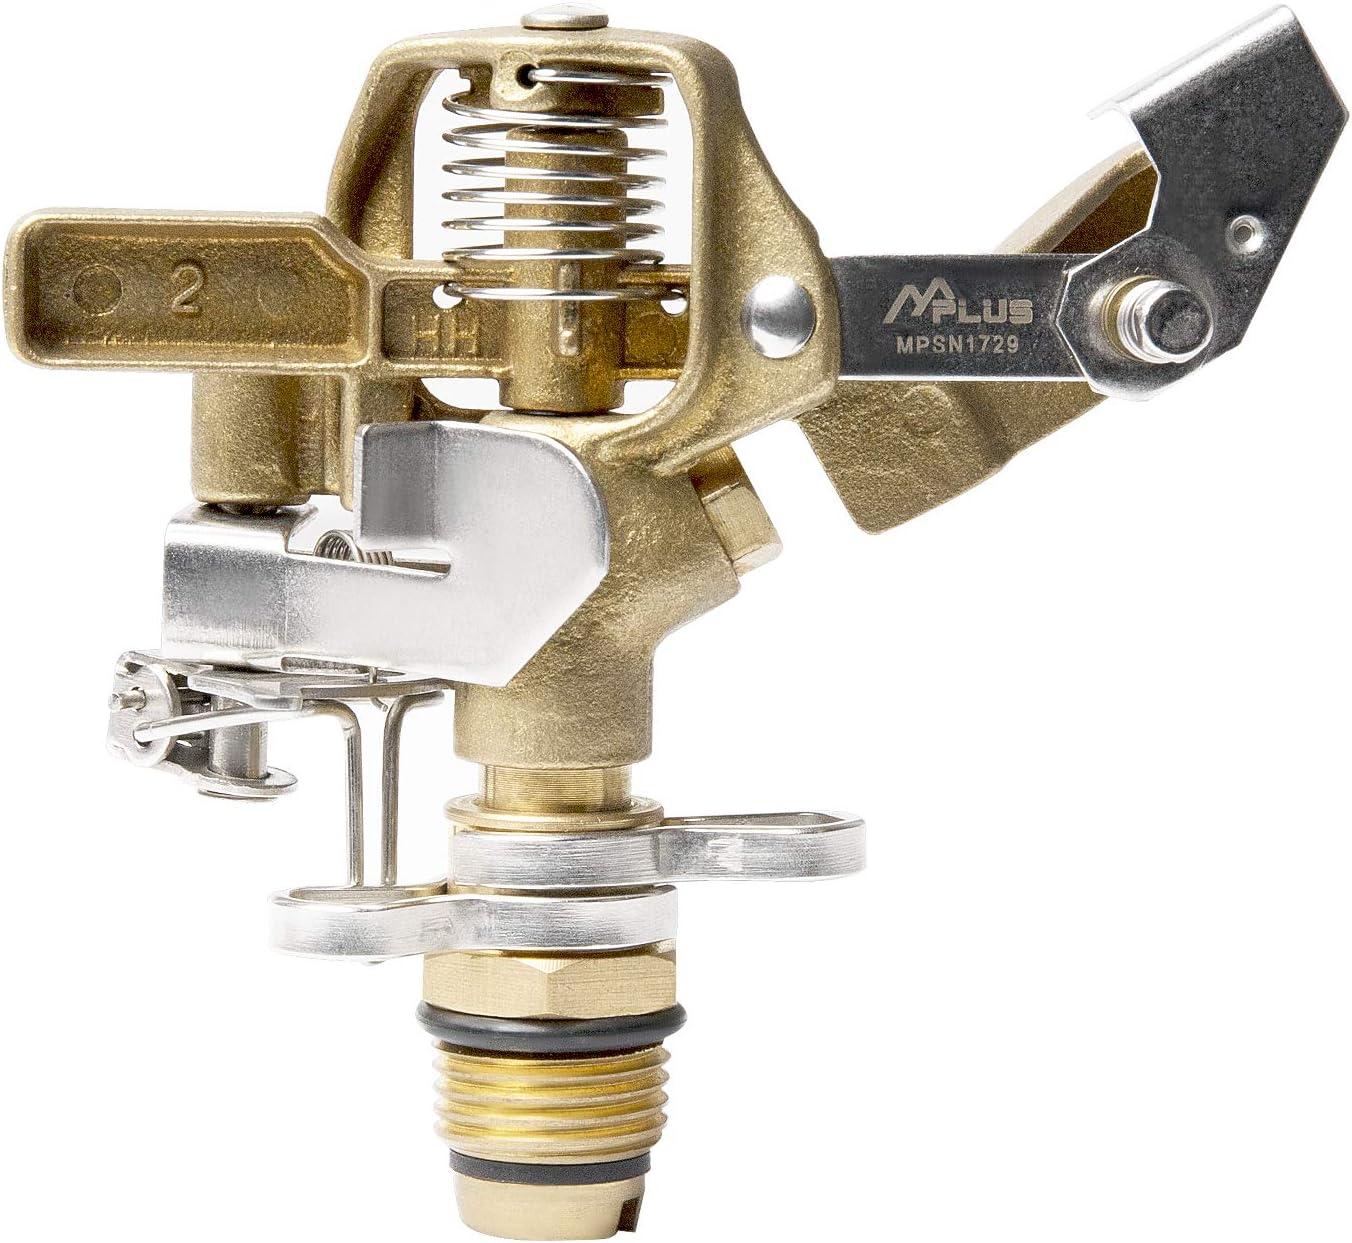 M PLUS Heavy Duty Brass Impact Sprinkler Adjustable Coverage Pattern Spray Distance Spray Flow for Garden Lawn